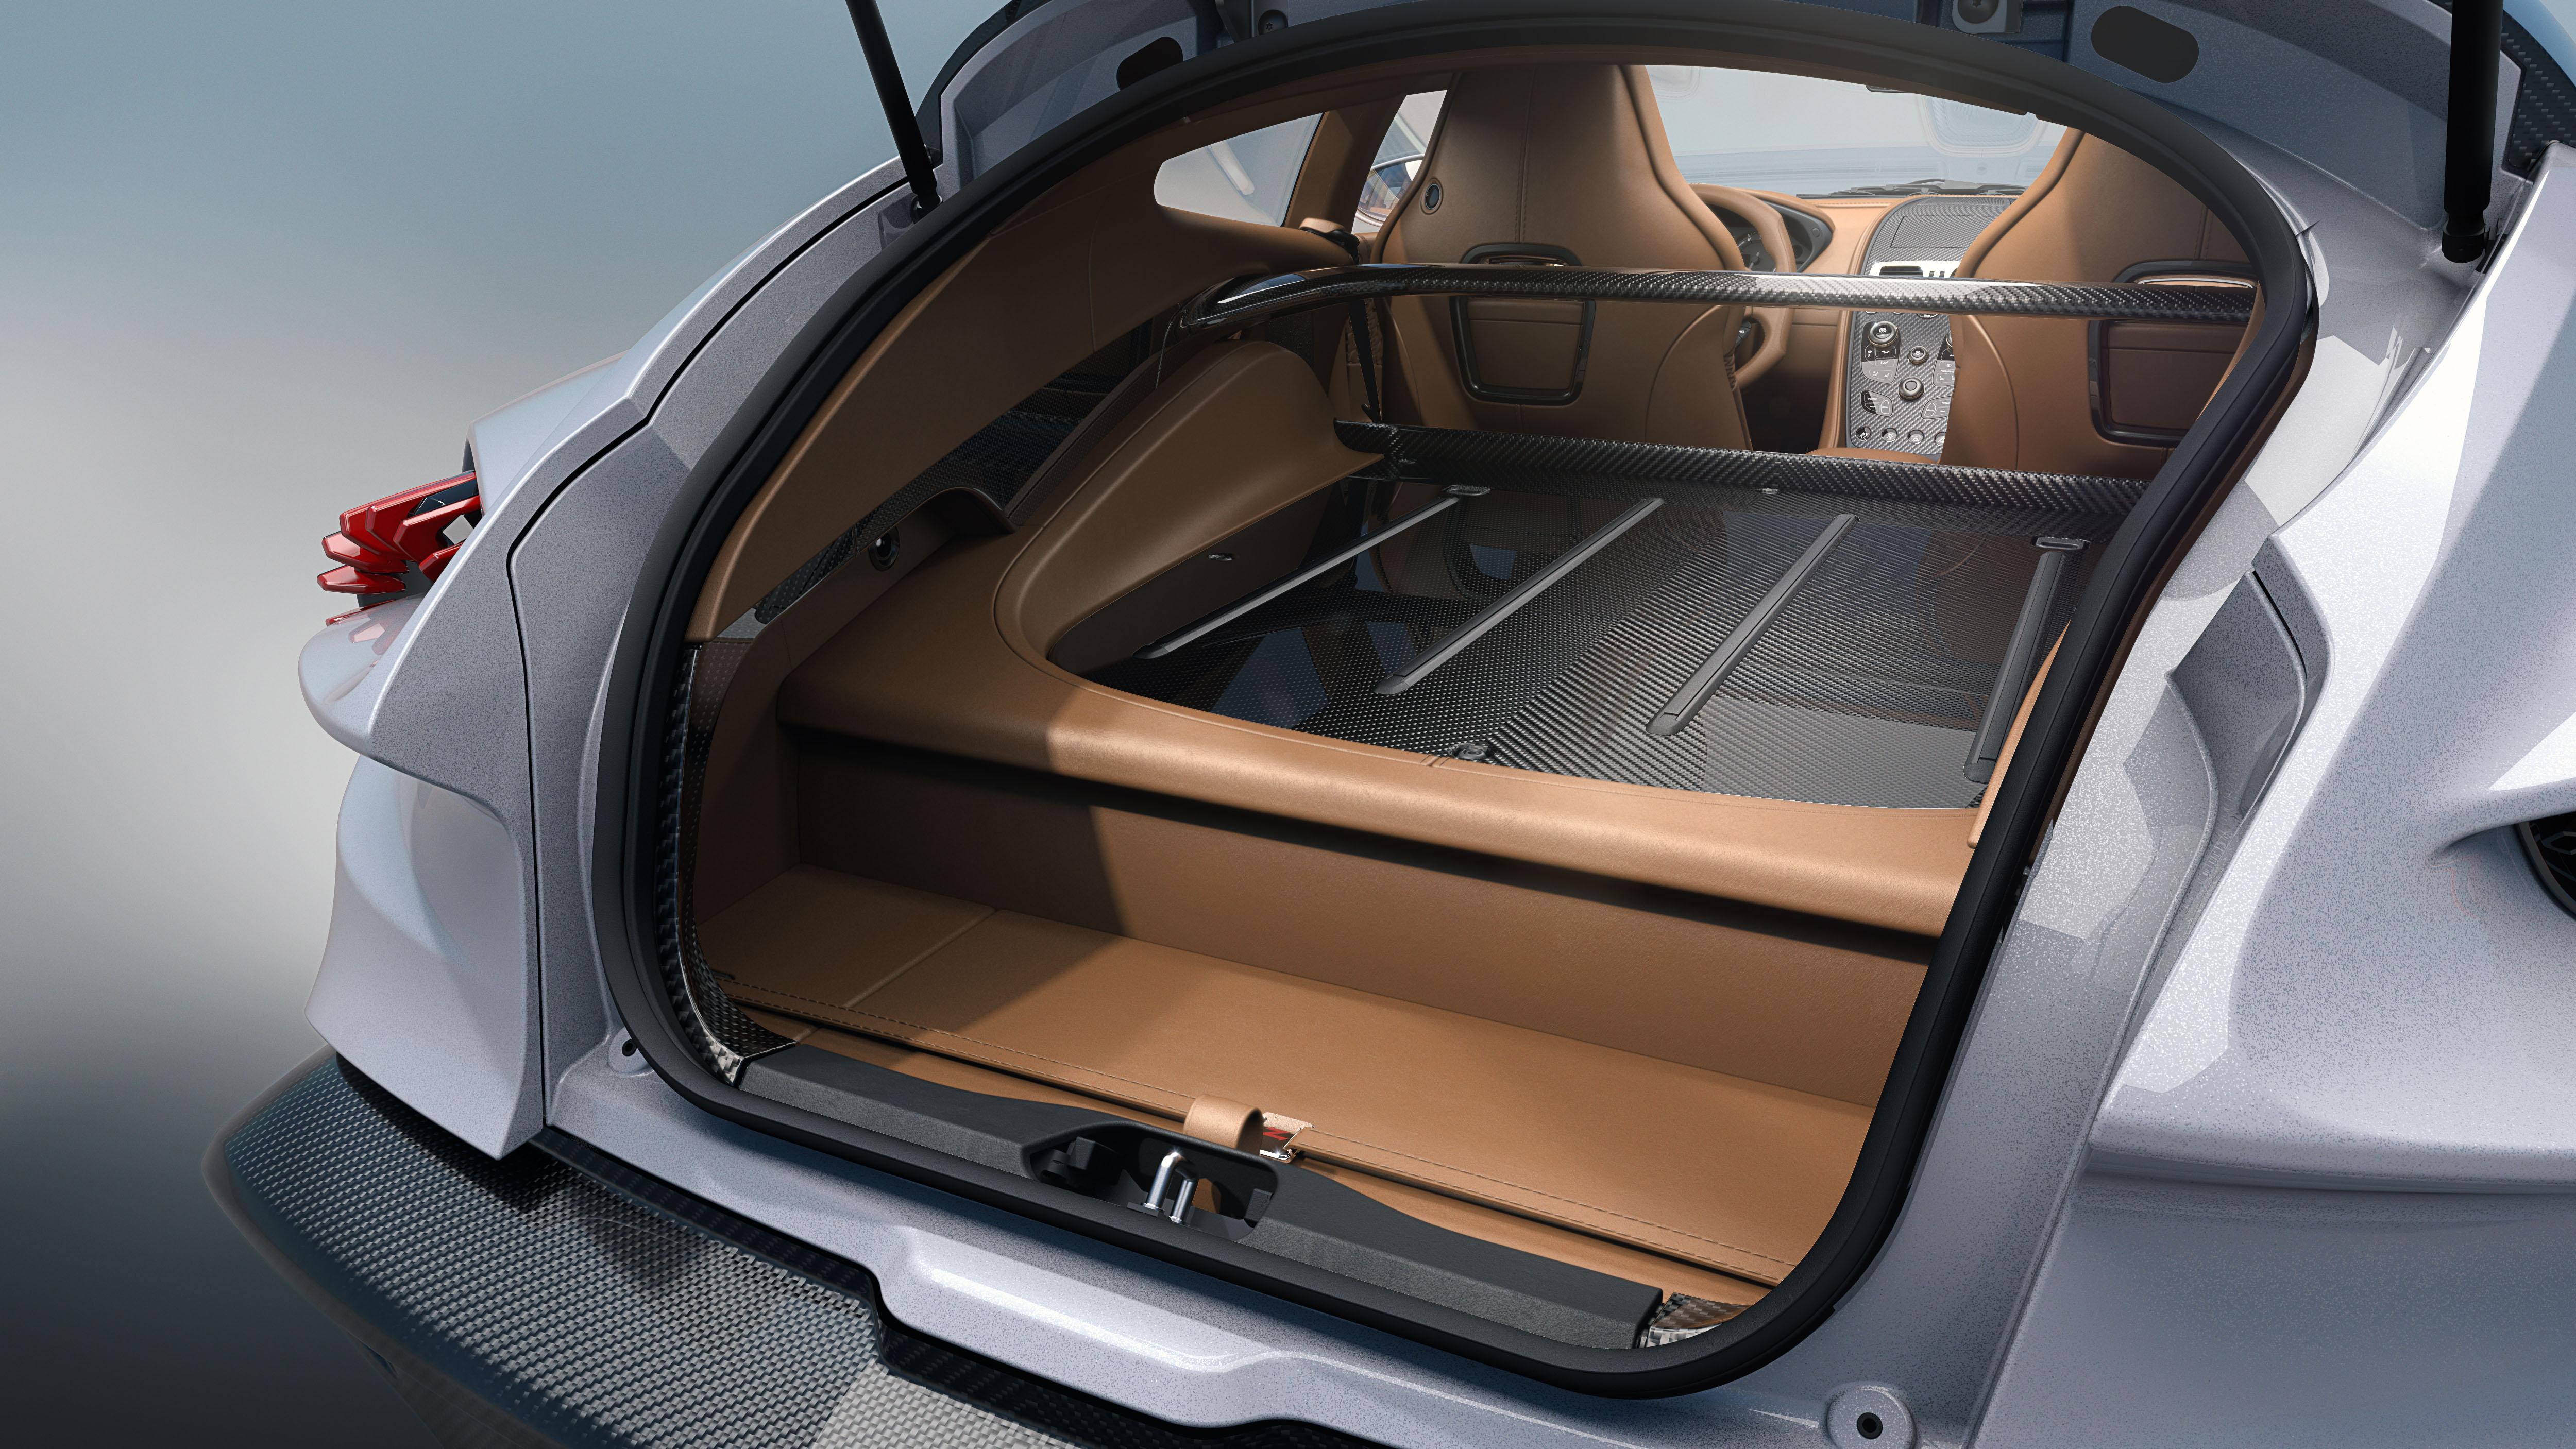 Aston Martin Vanquish Zagato Shooting Brake Interior Revealed Caradvice